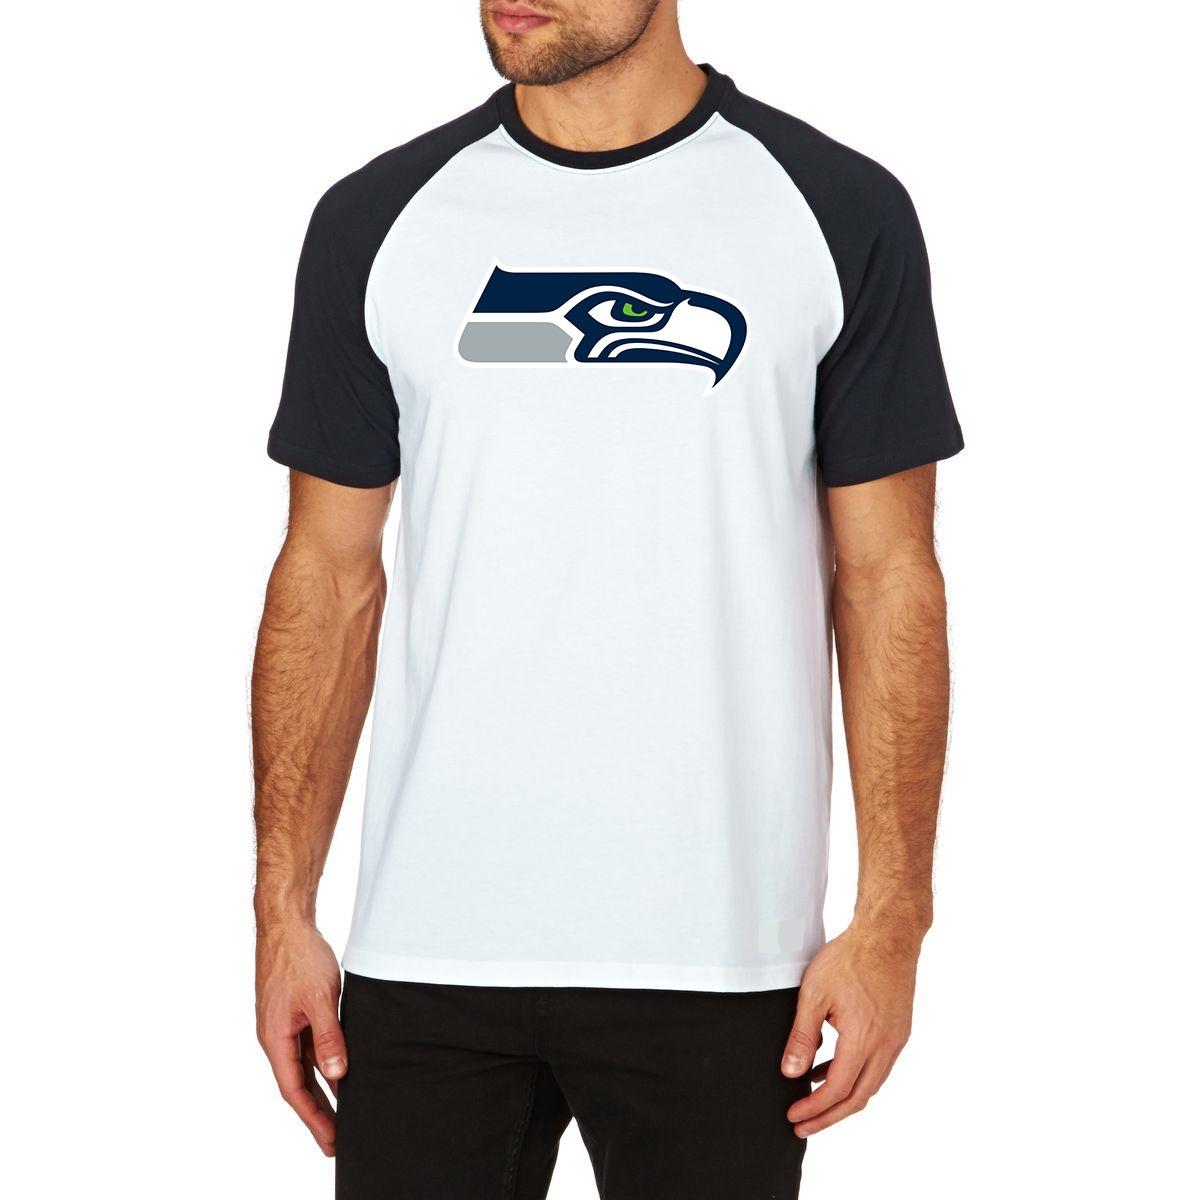 camiseta seattle seahawks raglan futebol americano nfl m02. Carregando zoom. 52fde027879